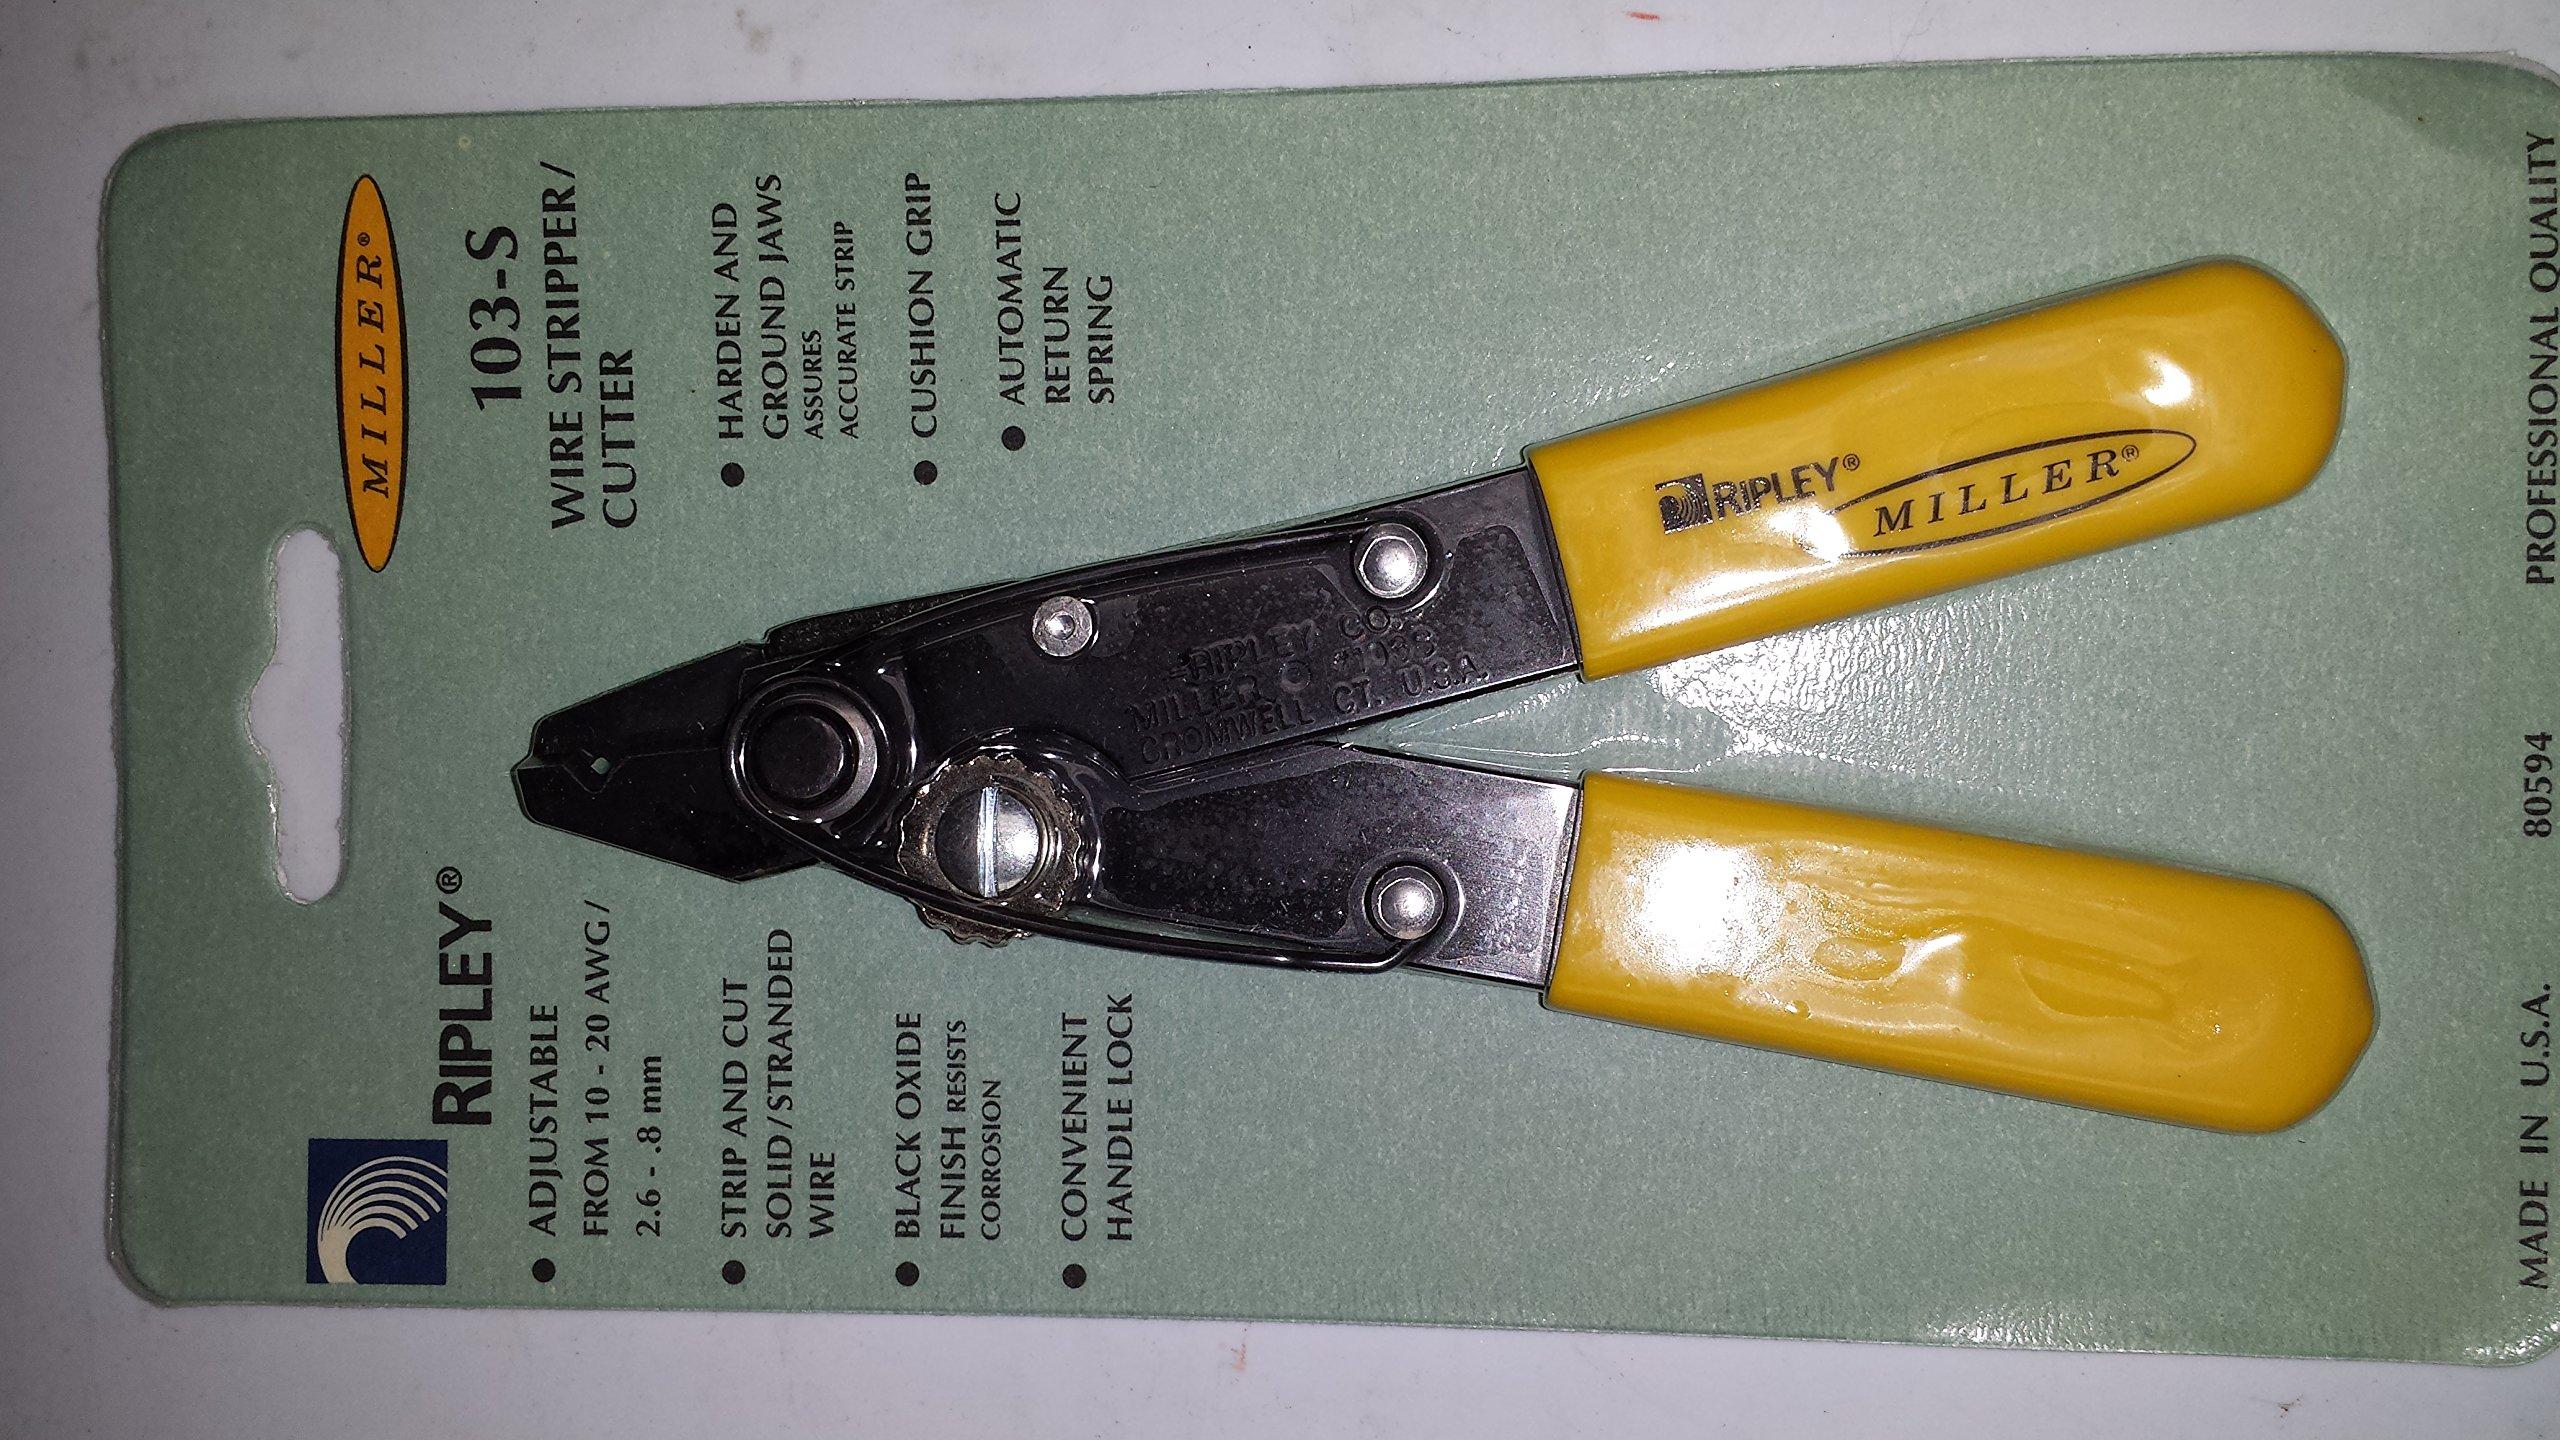 No. 103S Miller Wire Stripper & Cutter, Made in USA